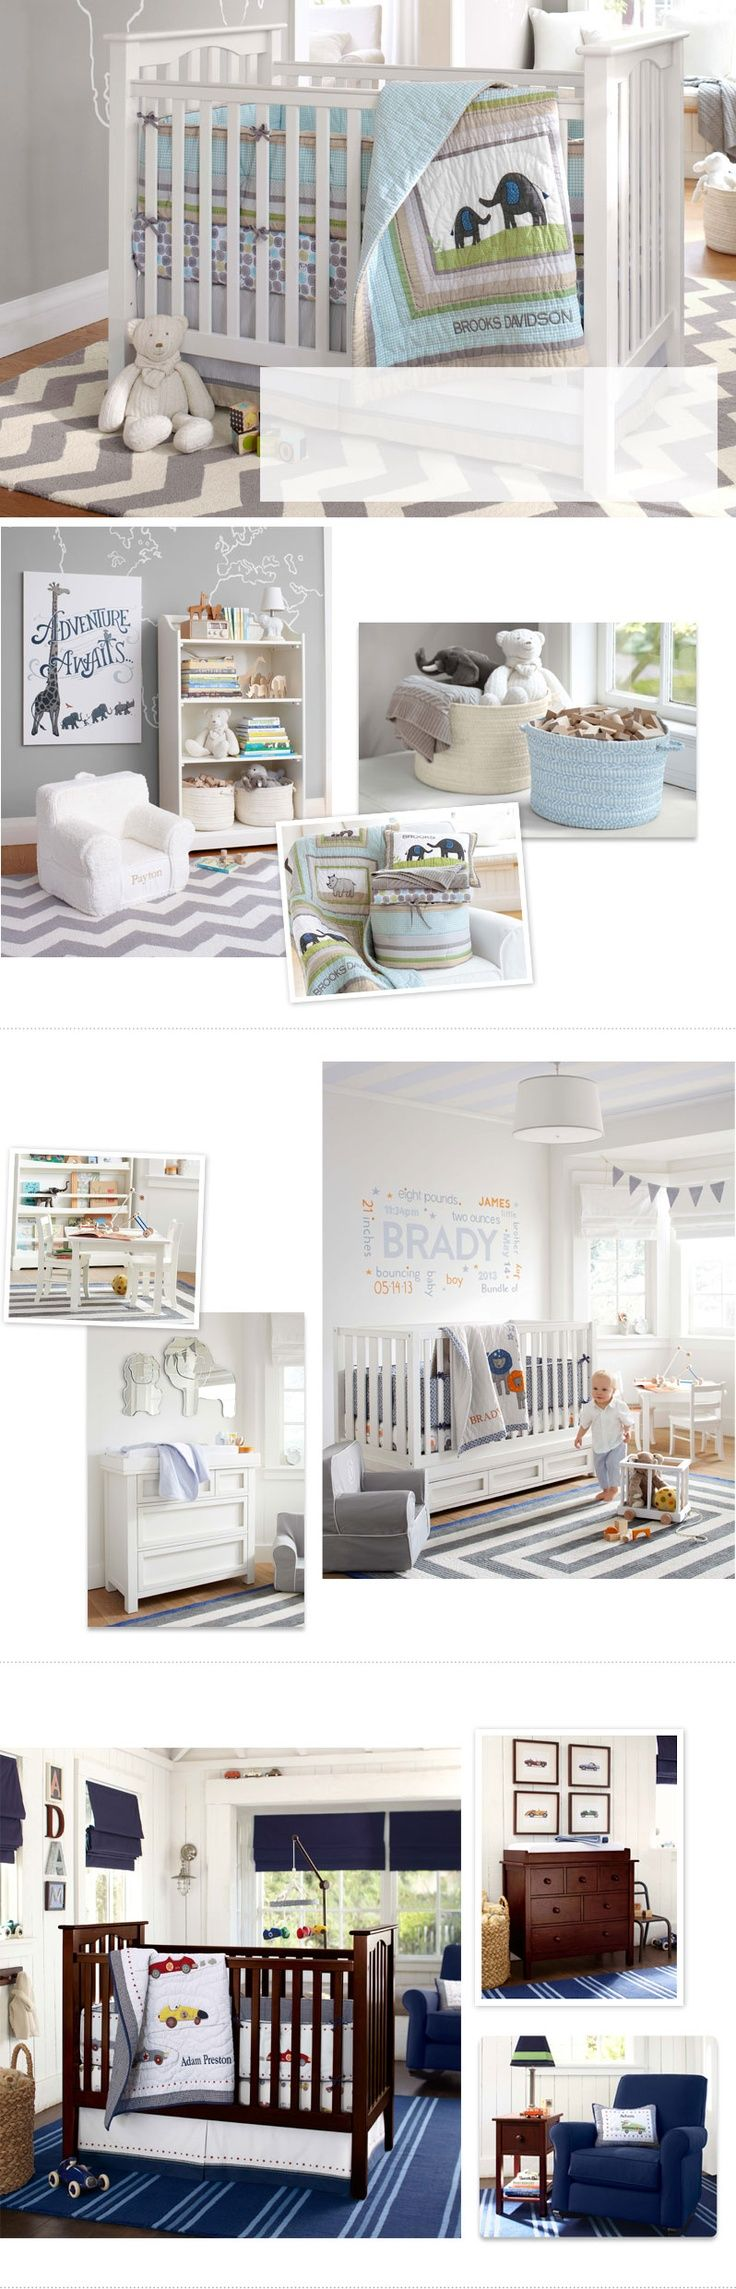 Baby Boy Nursery Ideas & Nursery Ideas for Boys   Pottery Barn Kids - writing on wall